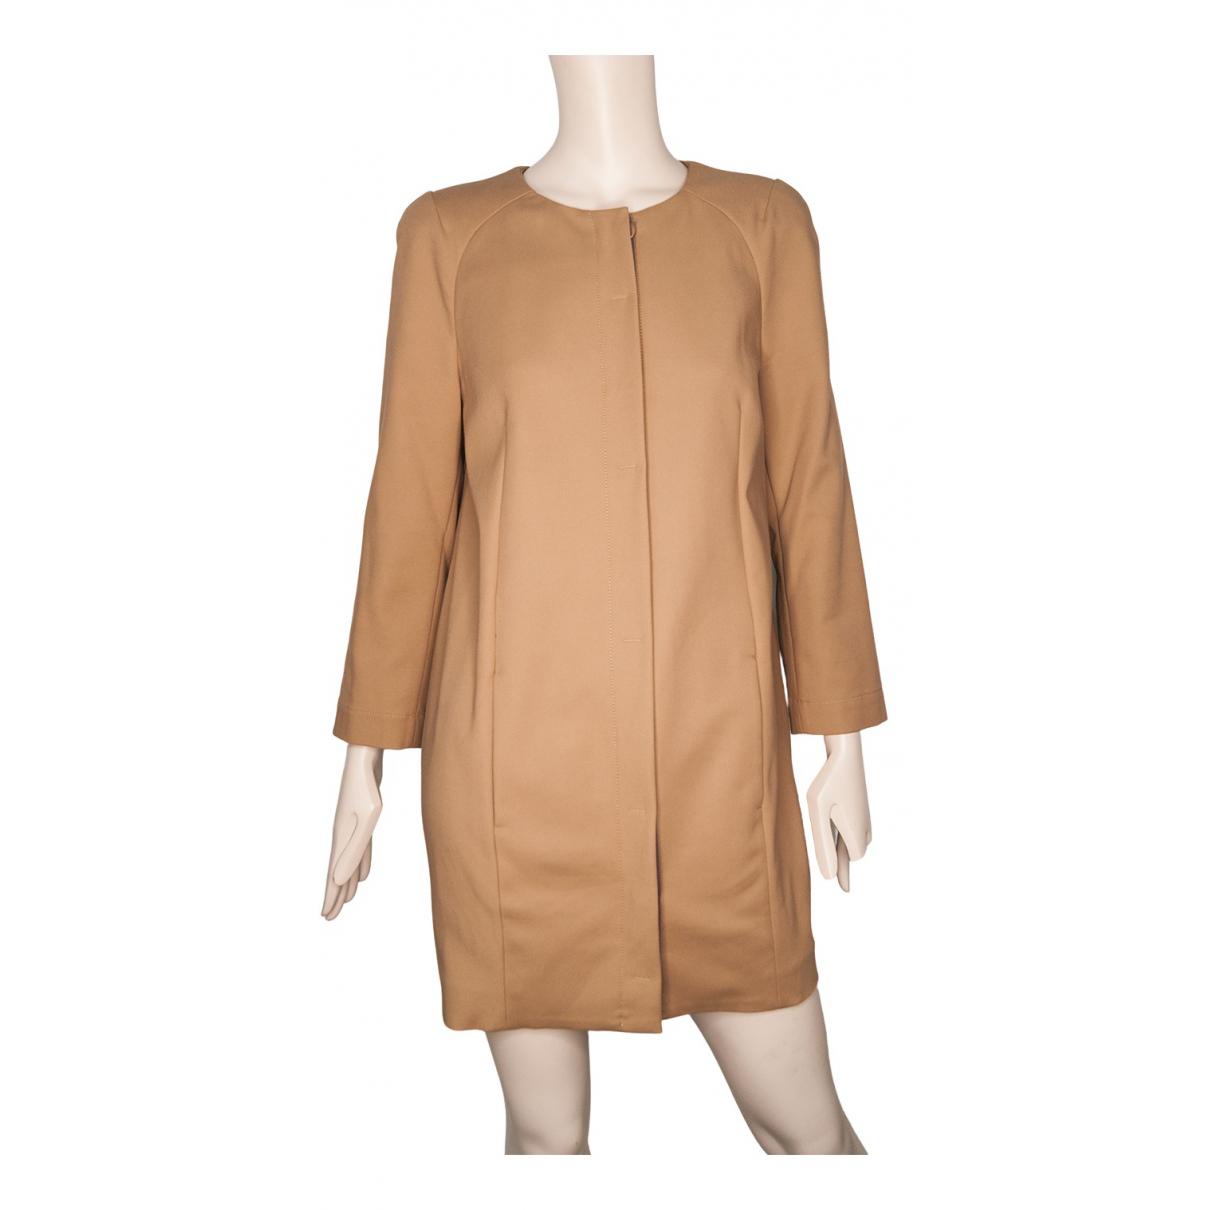 Patrizia Pepe \N Camel Cotton coat for Women 44 IT